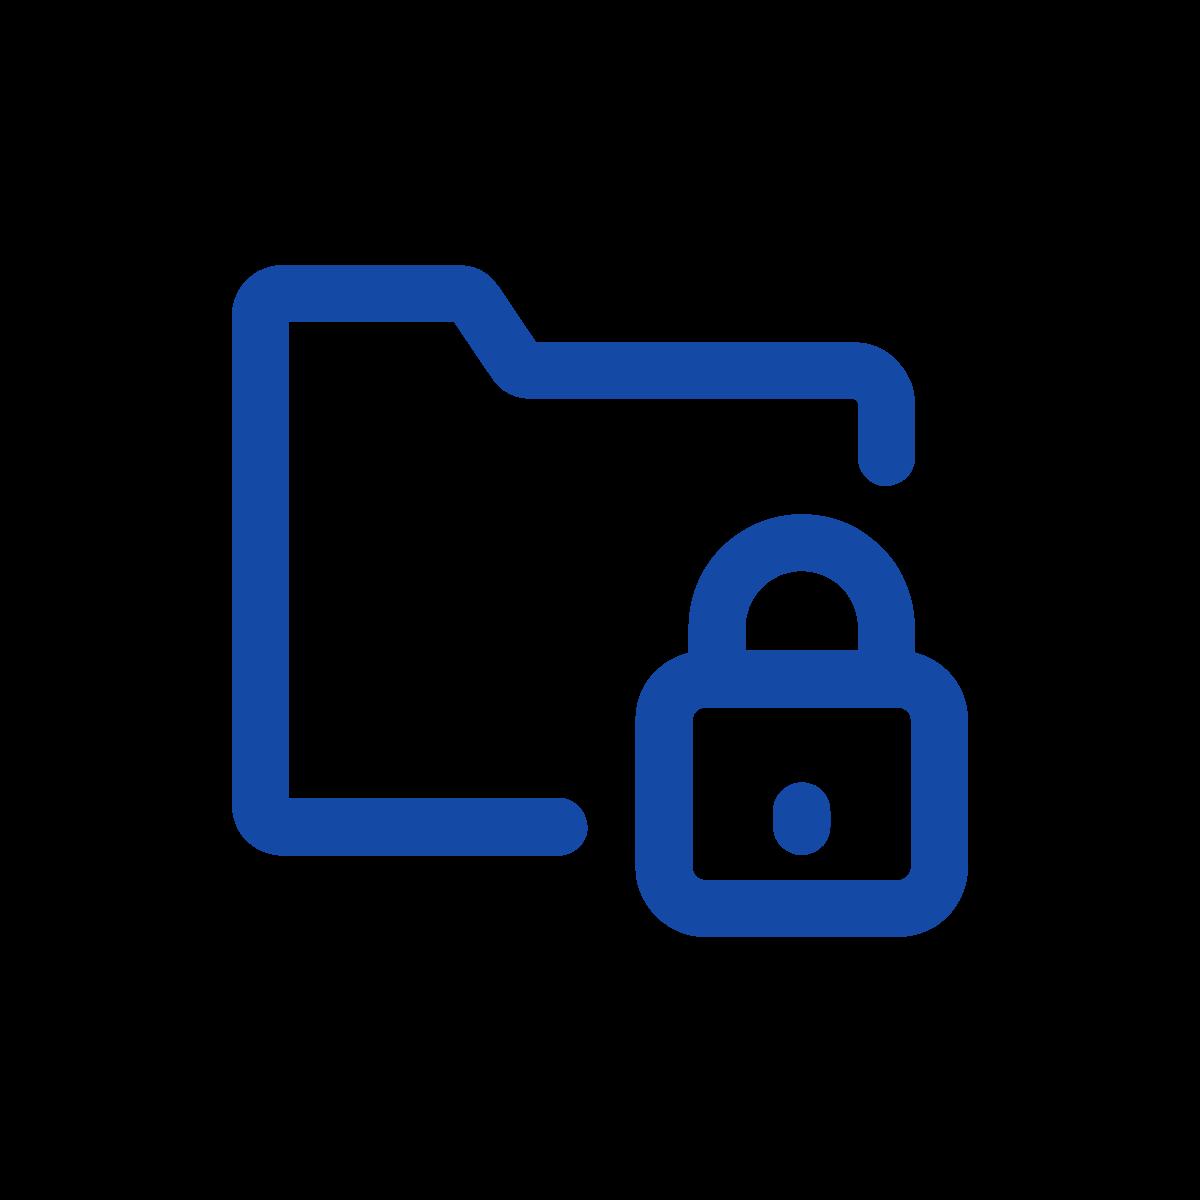 File folder with lock